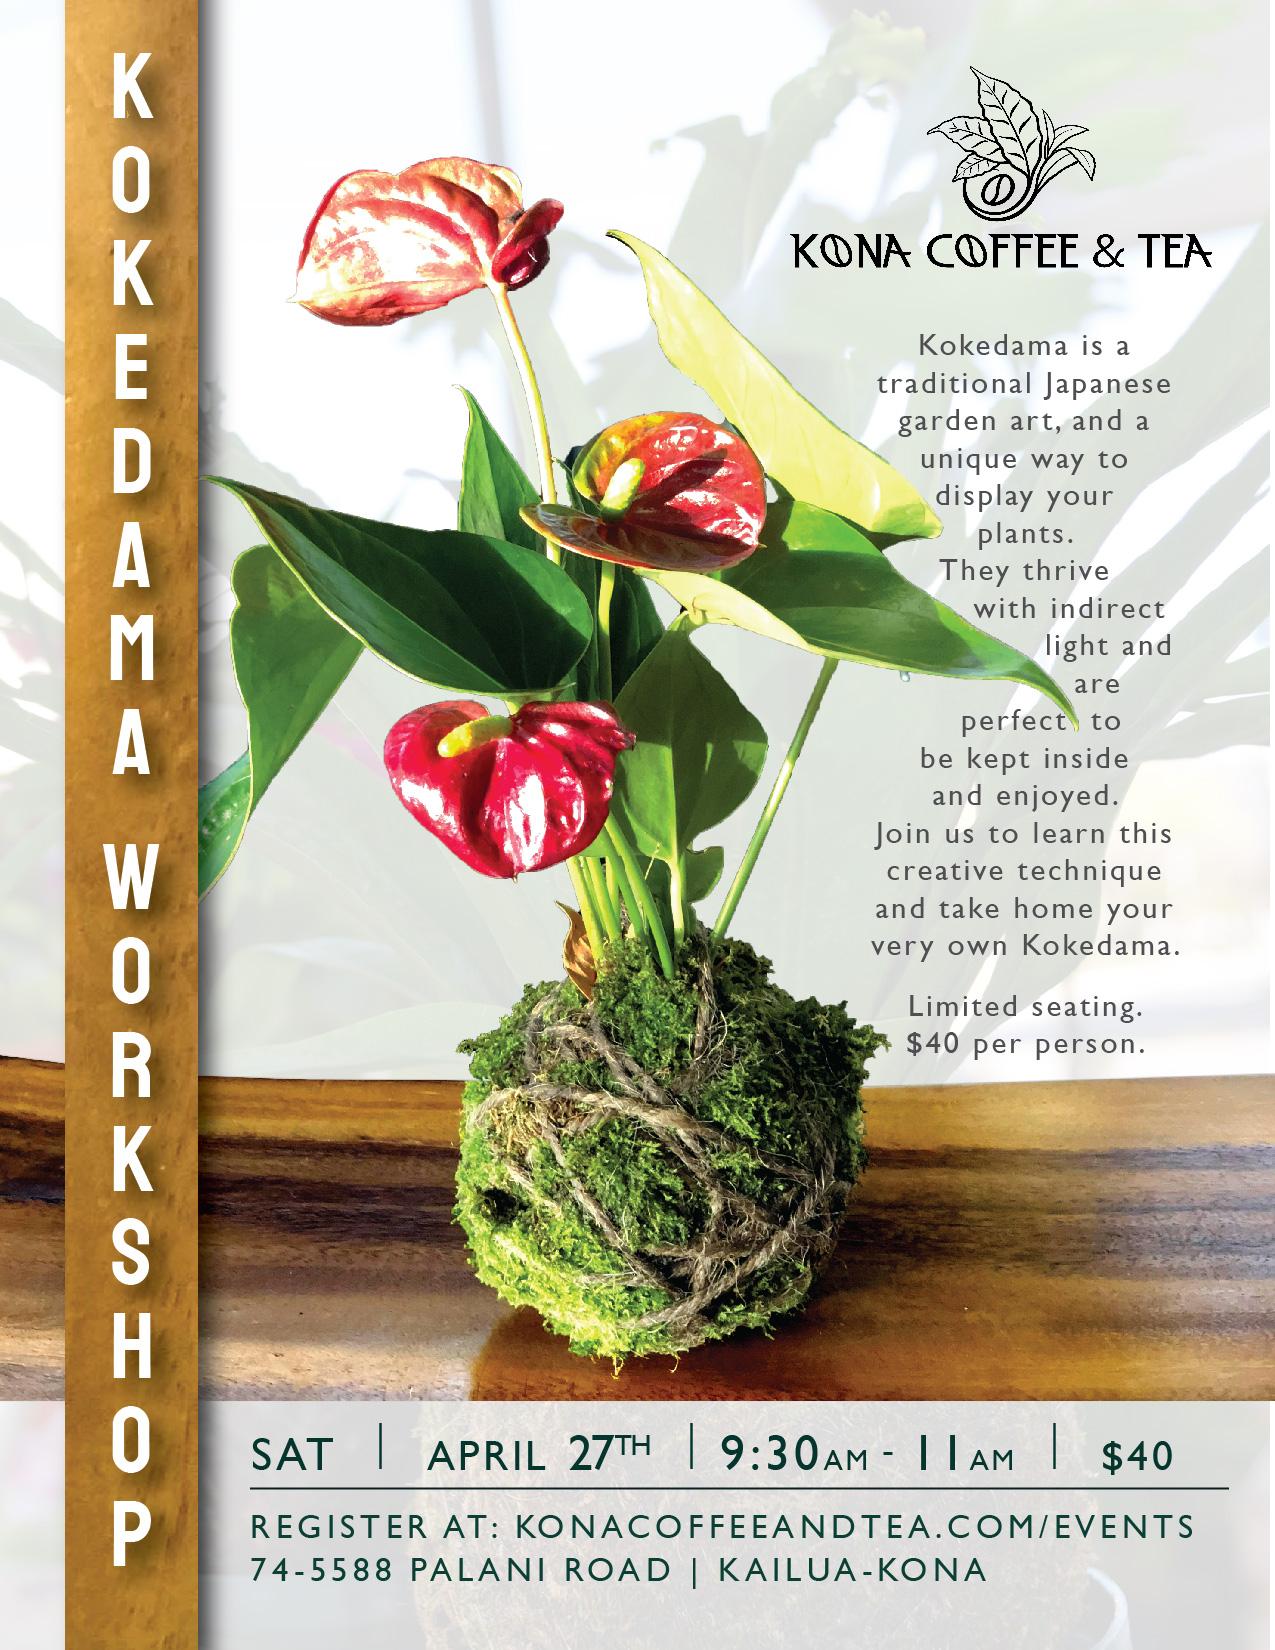 Web_Kokedama Workshop_4.27.19_Kona Coffee and Tea-01-01.jpg